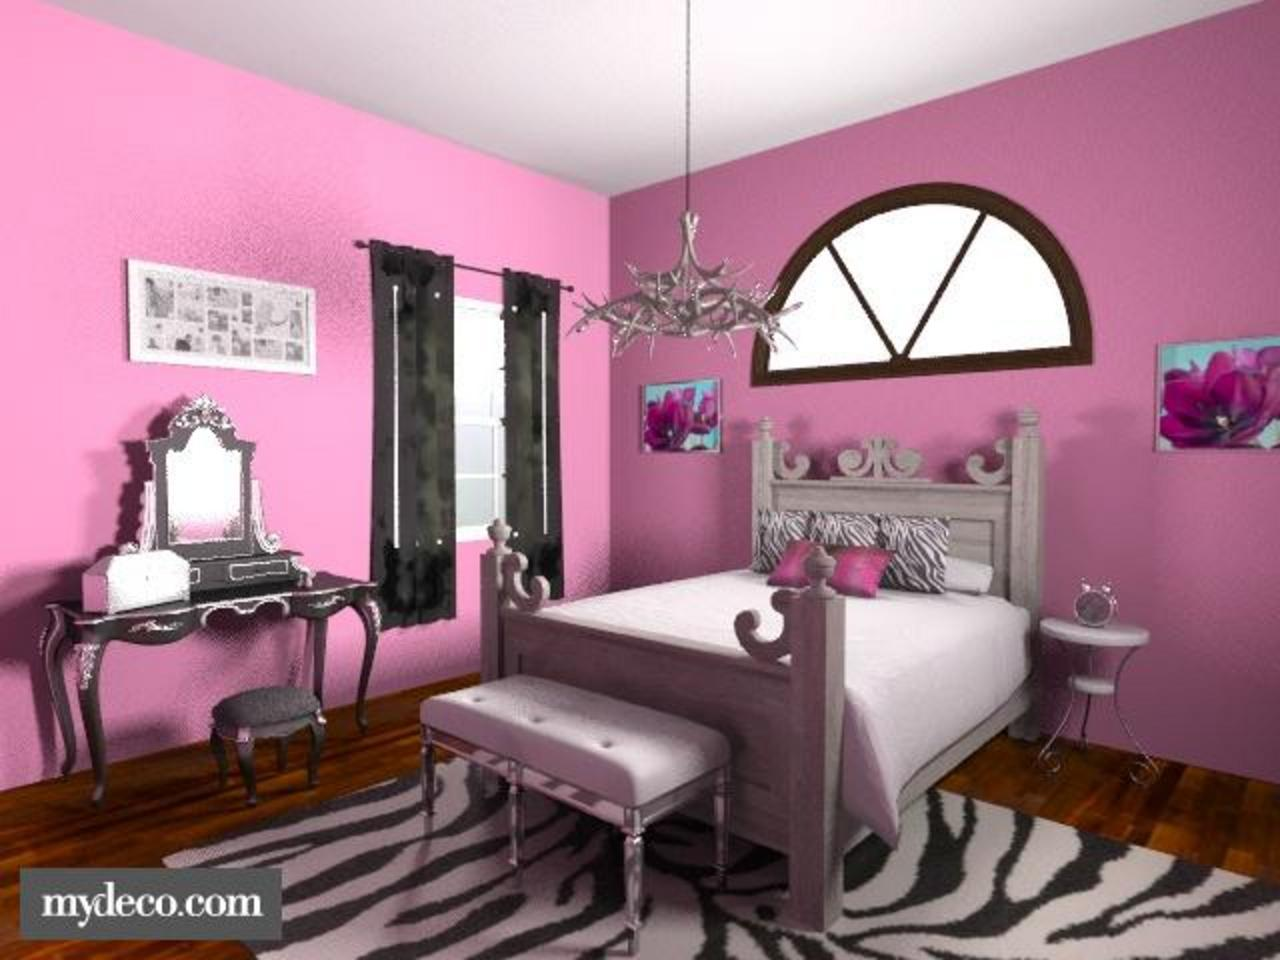 By elysemarie & Create 12 Year Old Girl\u0027s Dream Bedroom contest on Roomstyler